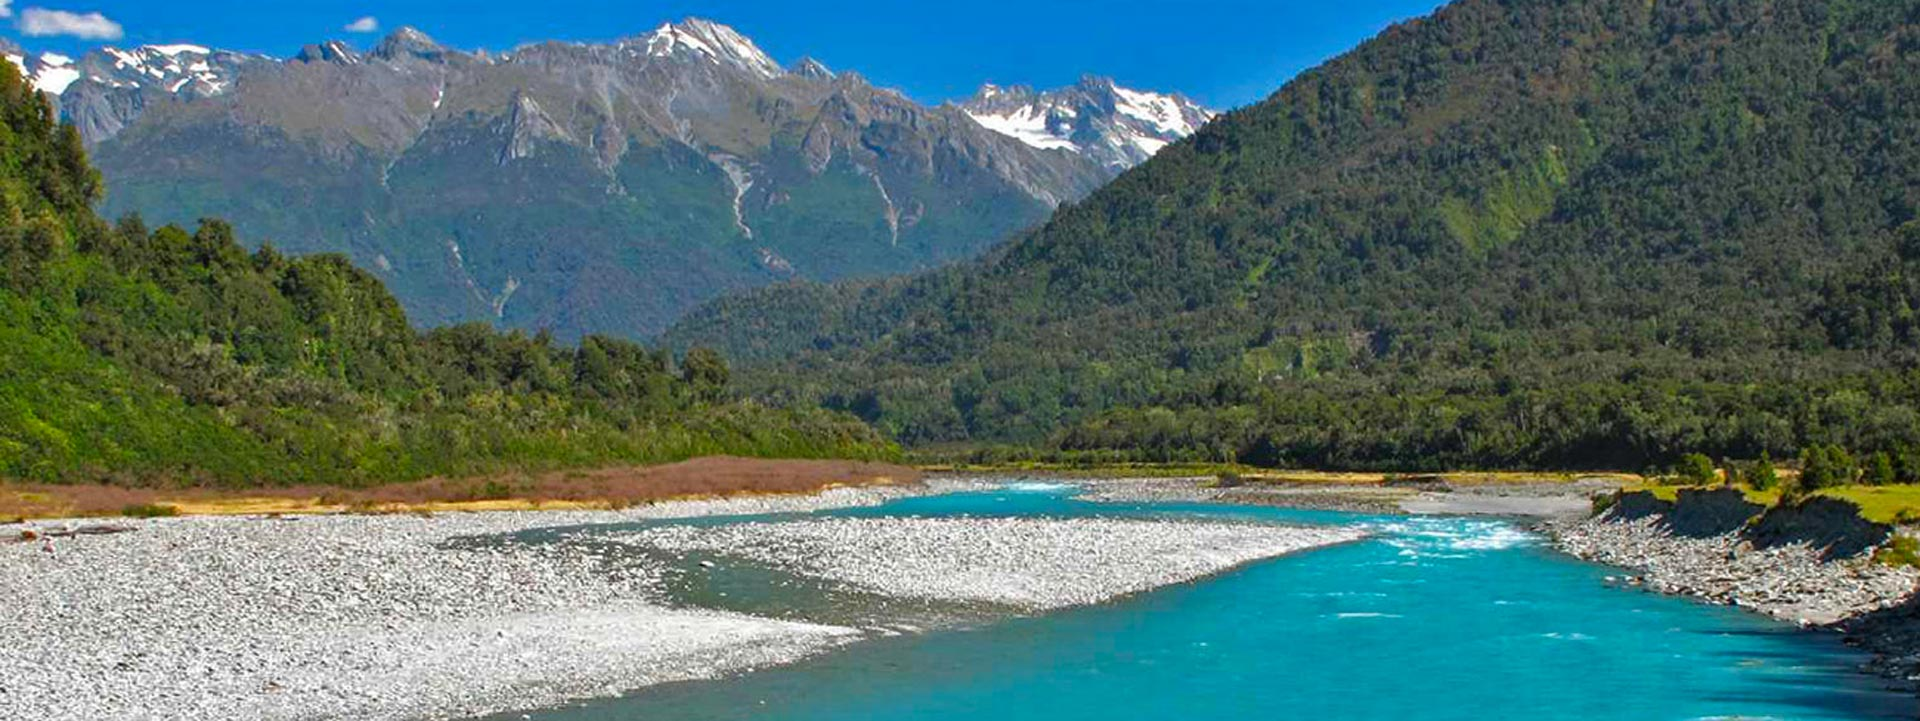 New Zealand Rivers Header